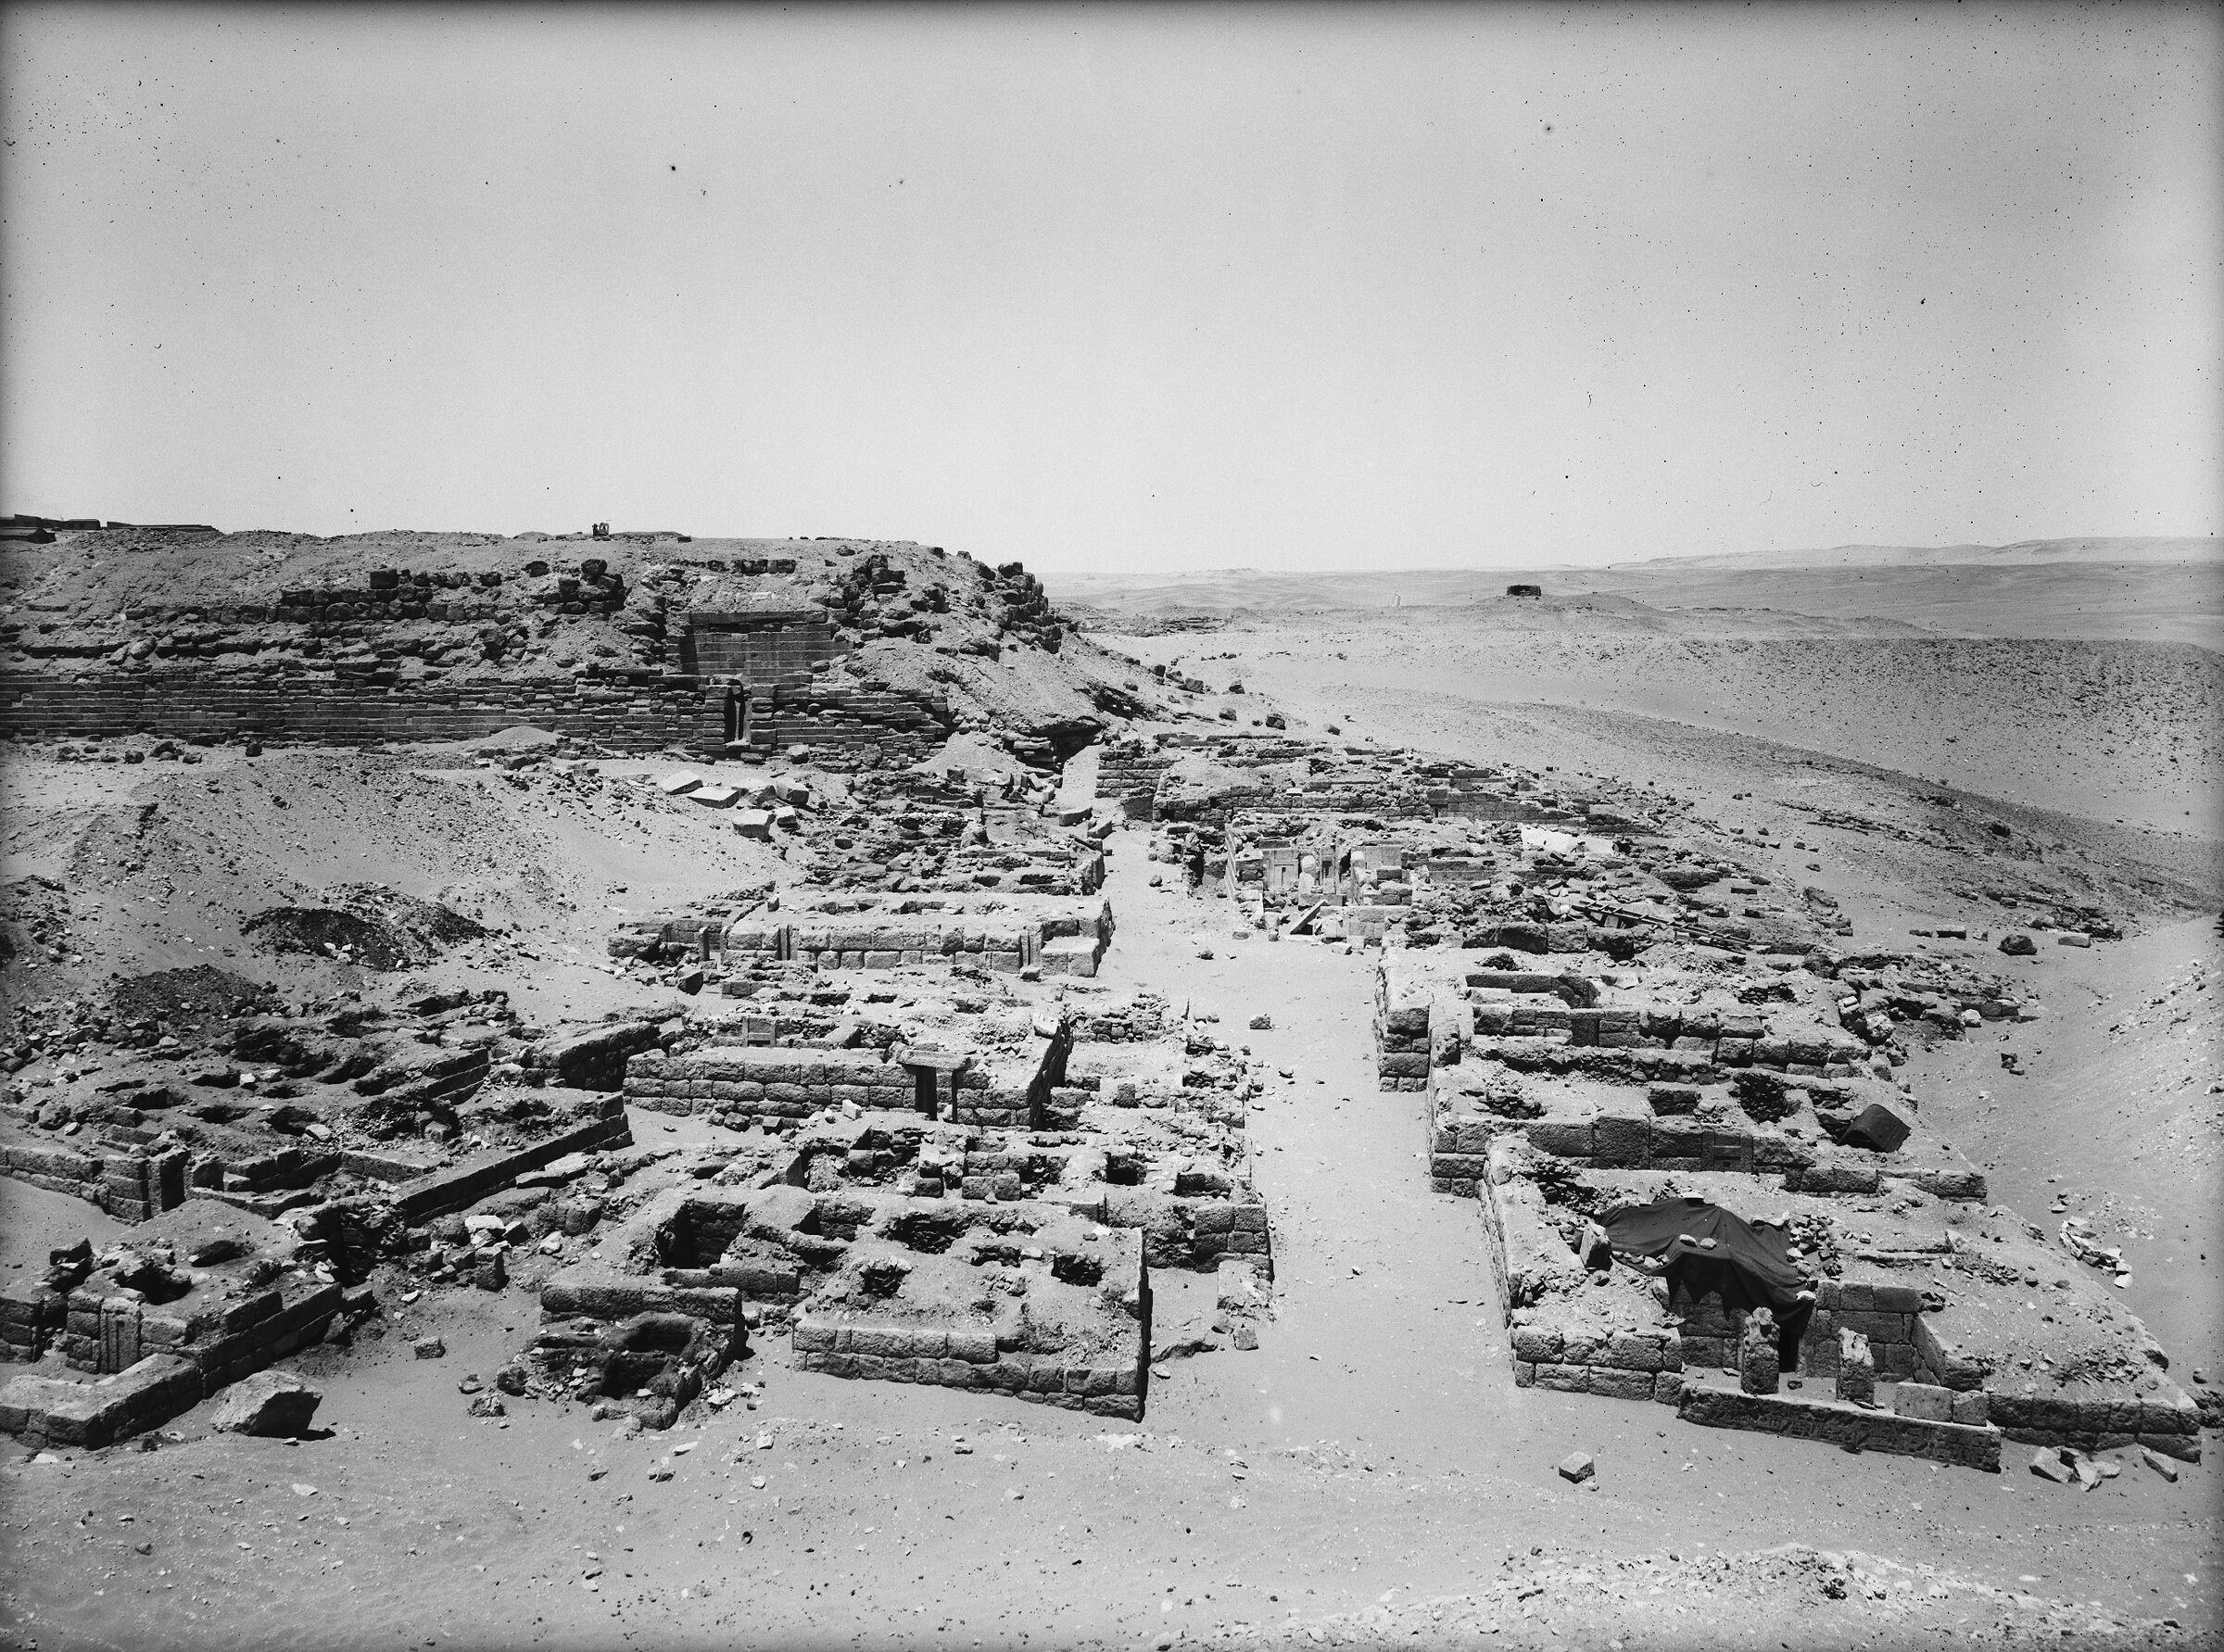 Western Cemetery: Site: Giza; View: G 2243, G 2244, G 2246, G 2243, G 2242, G 2239, G 2240